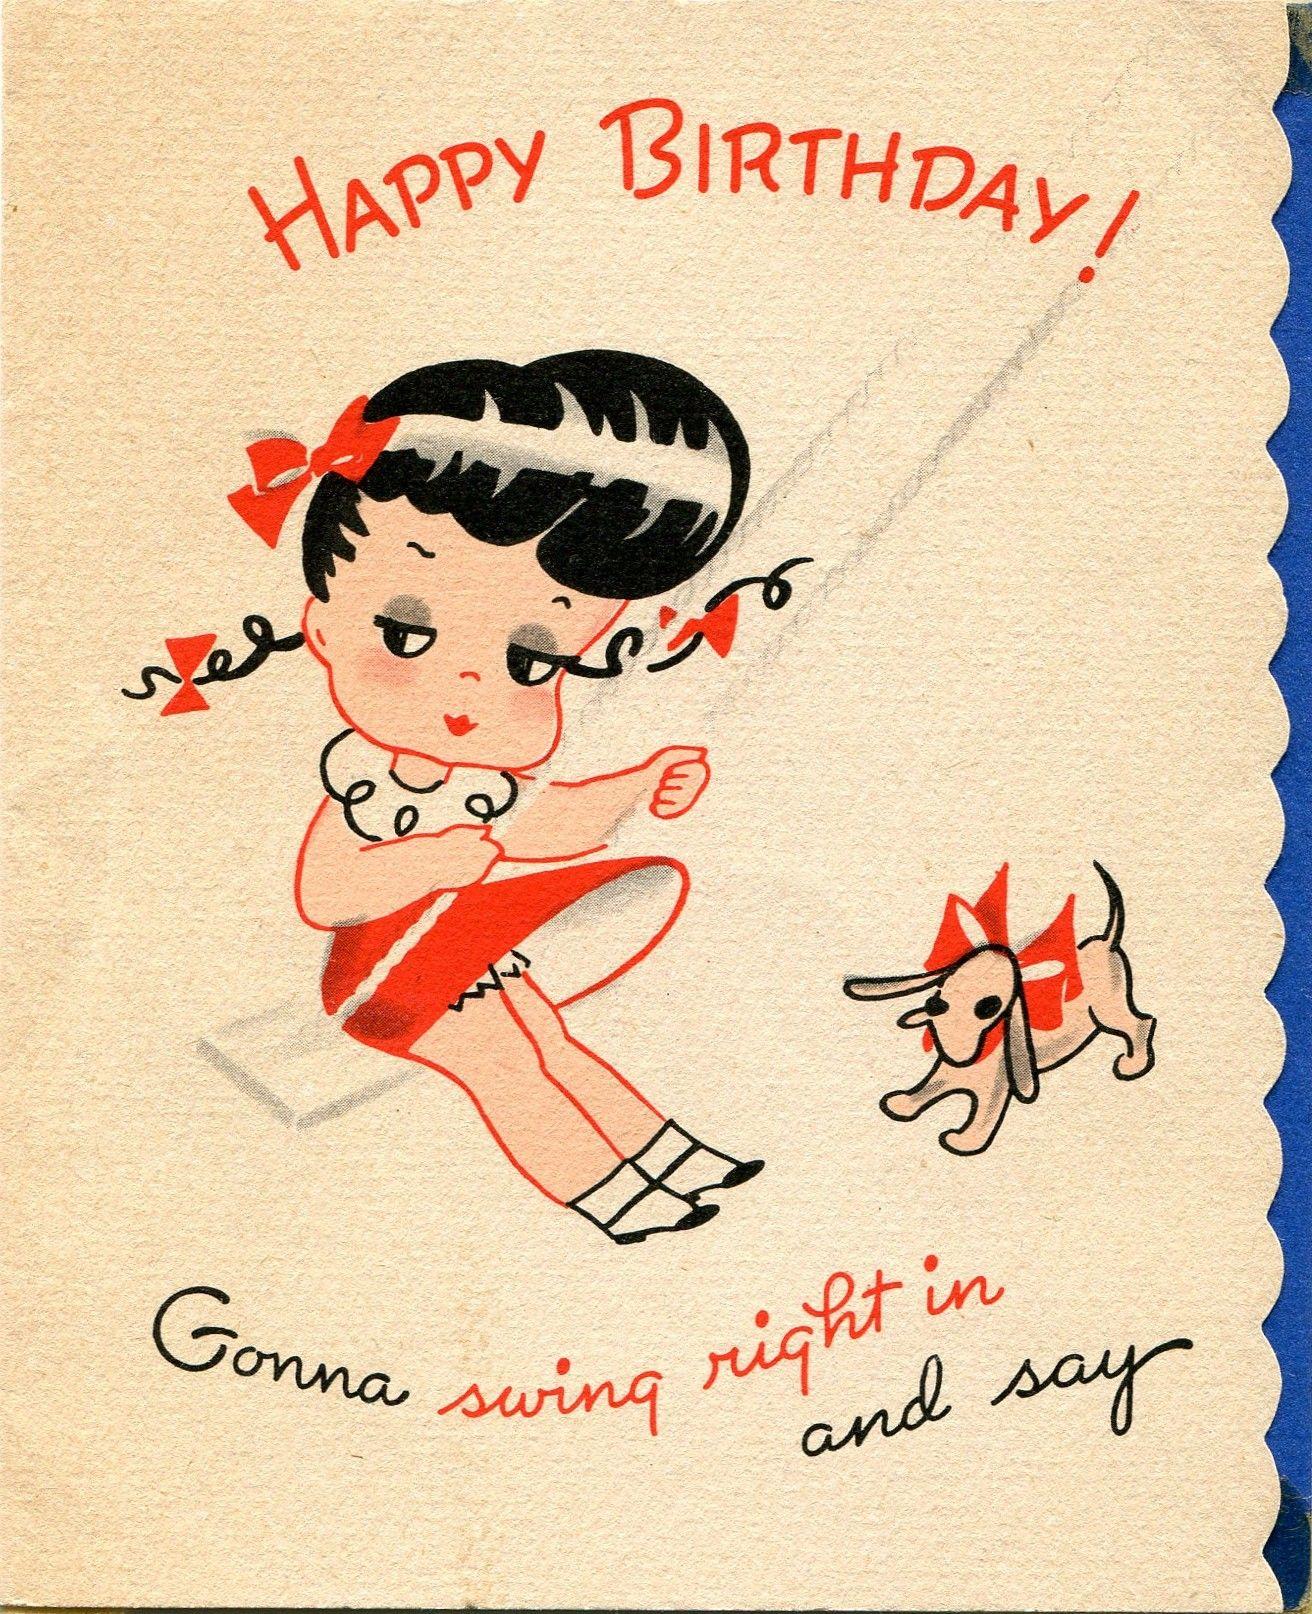 1948 Birthday Card Vintage Birthday Cards Birthday Cards Vintage Birthday